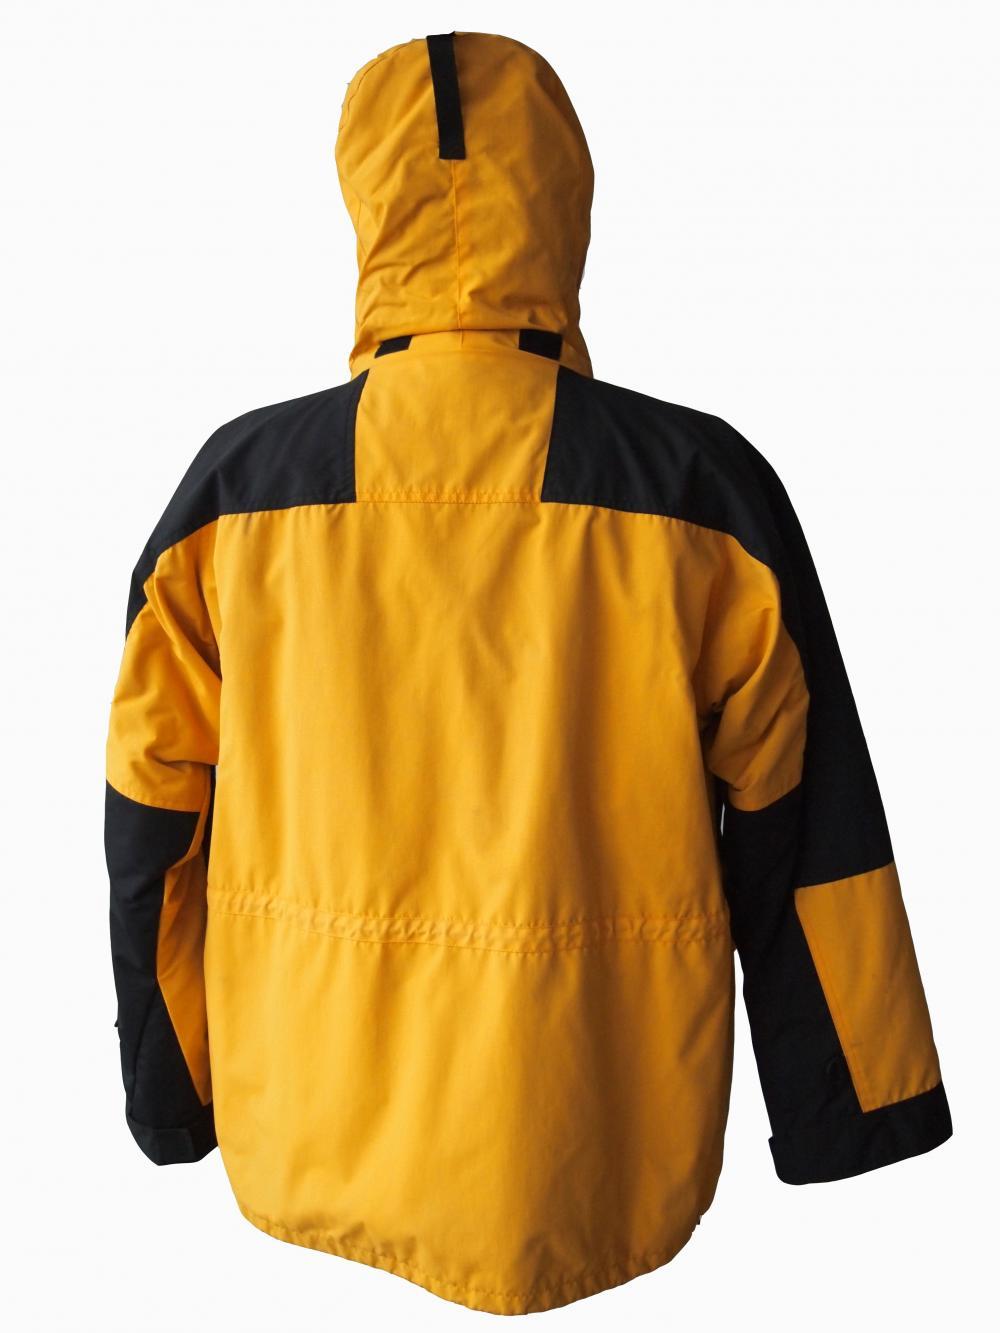 Ptfe Laminated Membrane Jacket And Shirt China Manufacturer